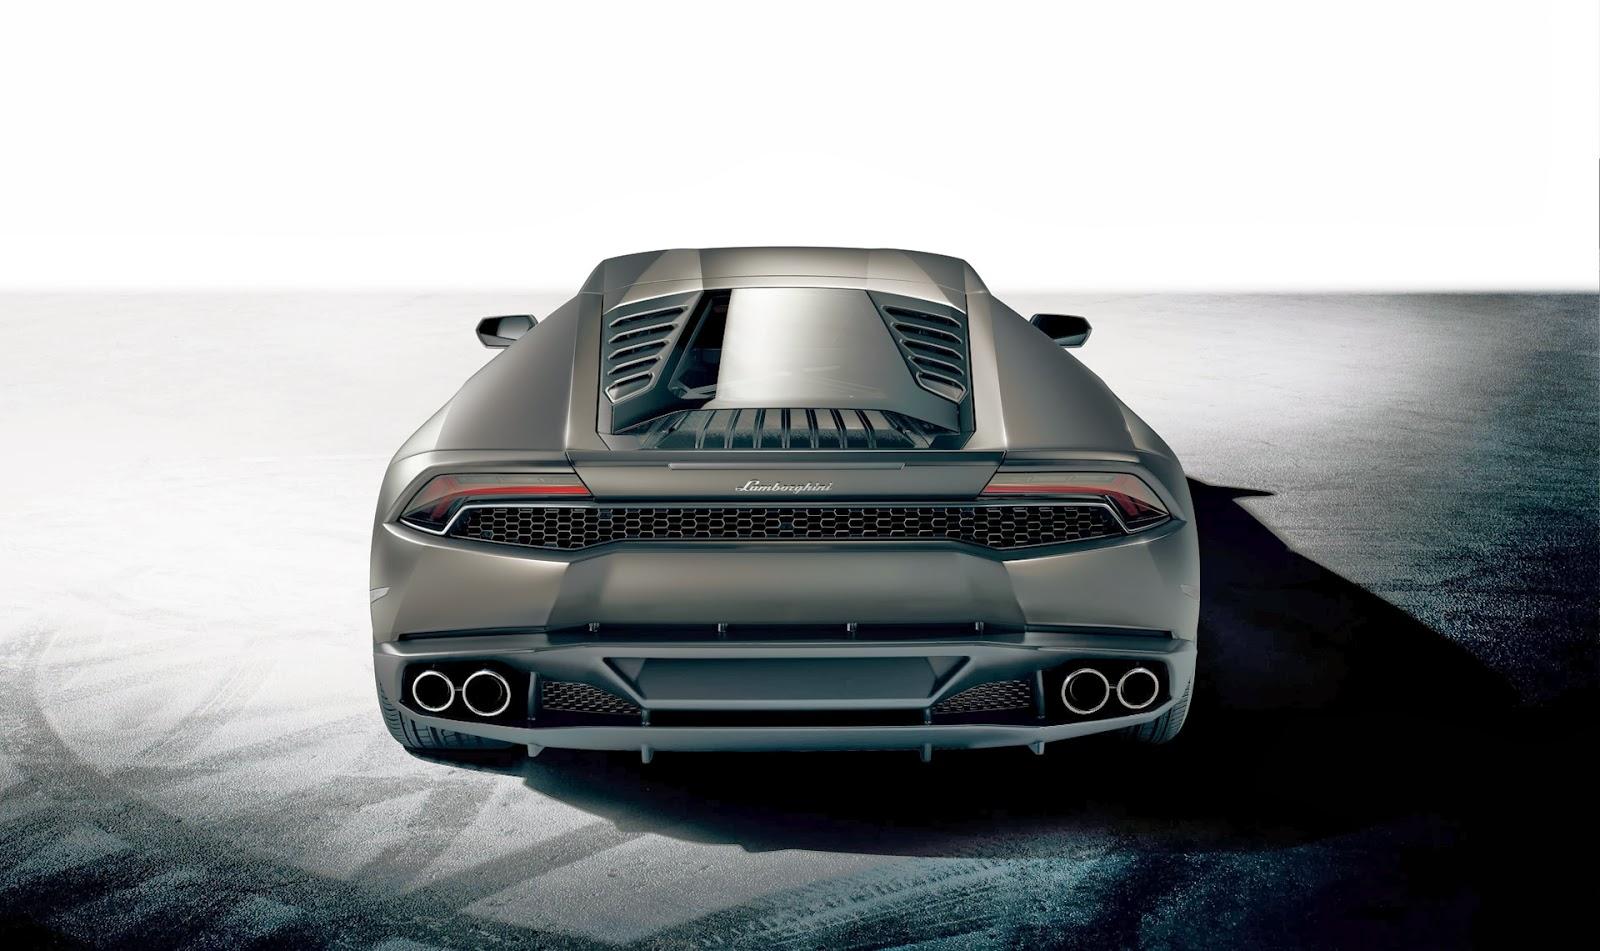 La Lamborghini Huracán enregistre déjà 700 commandes